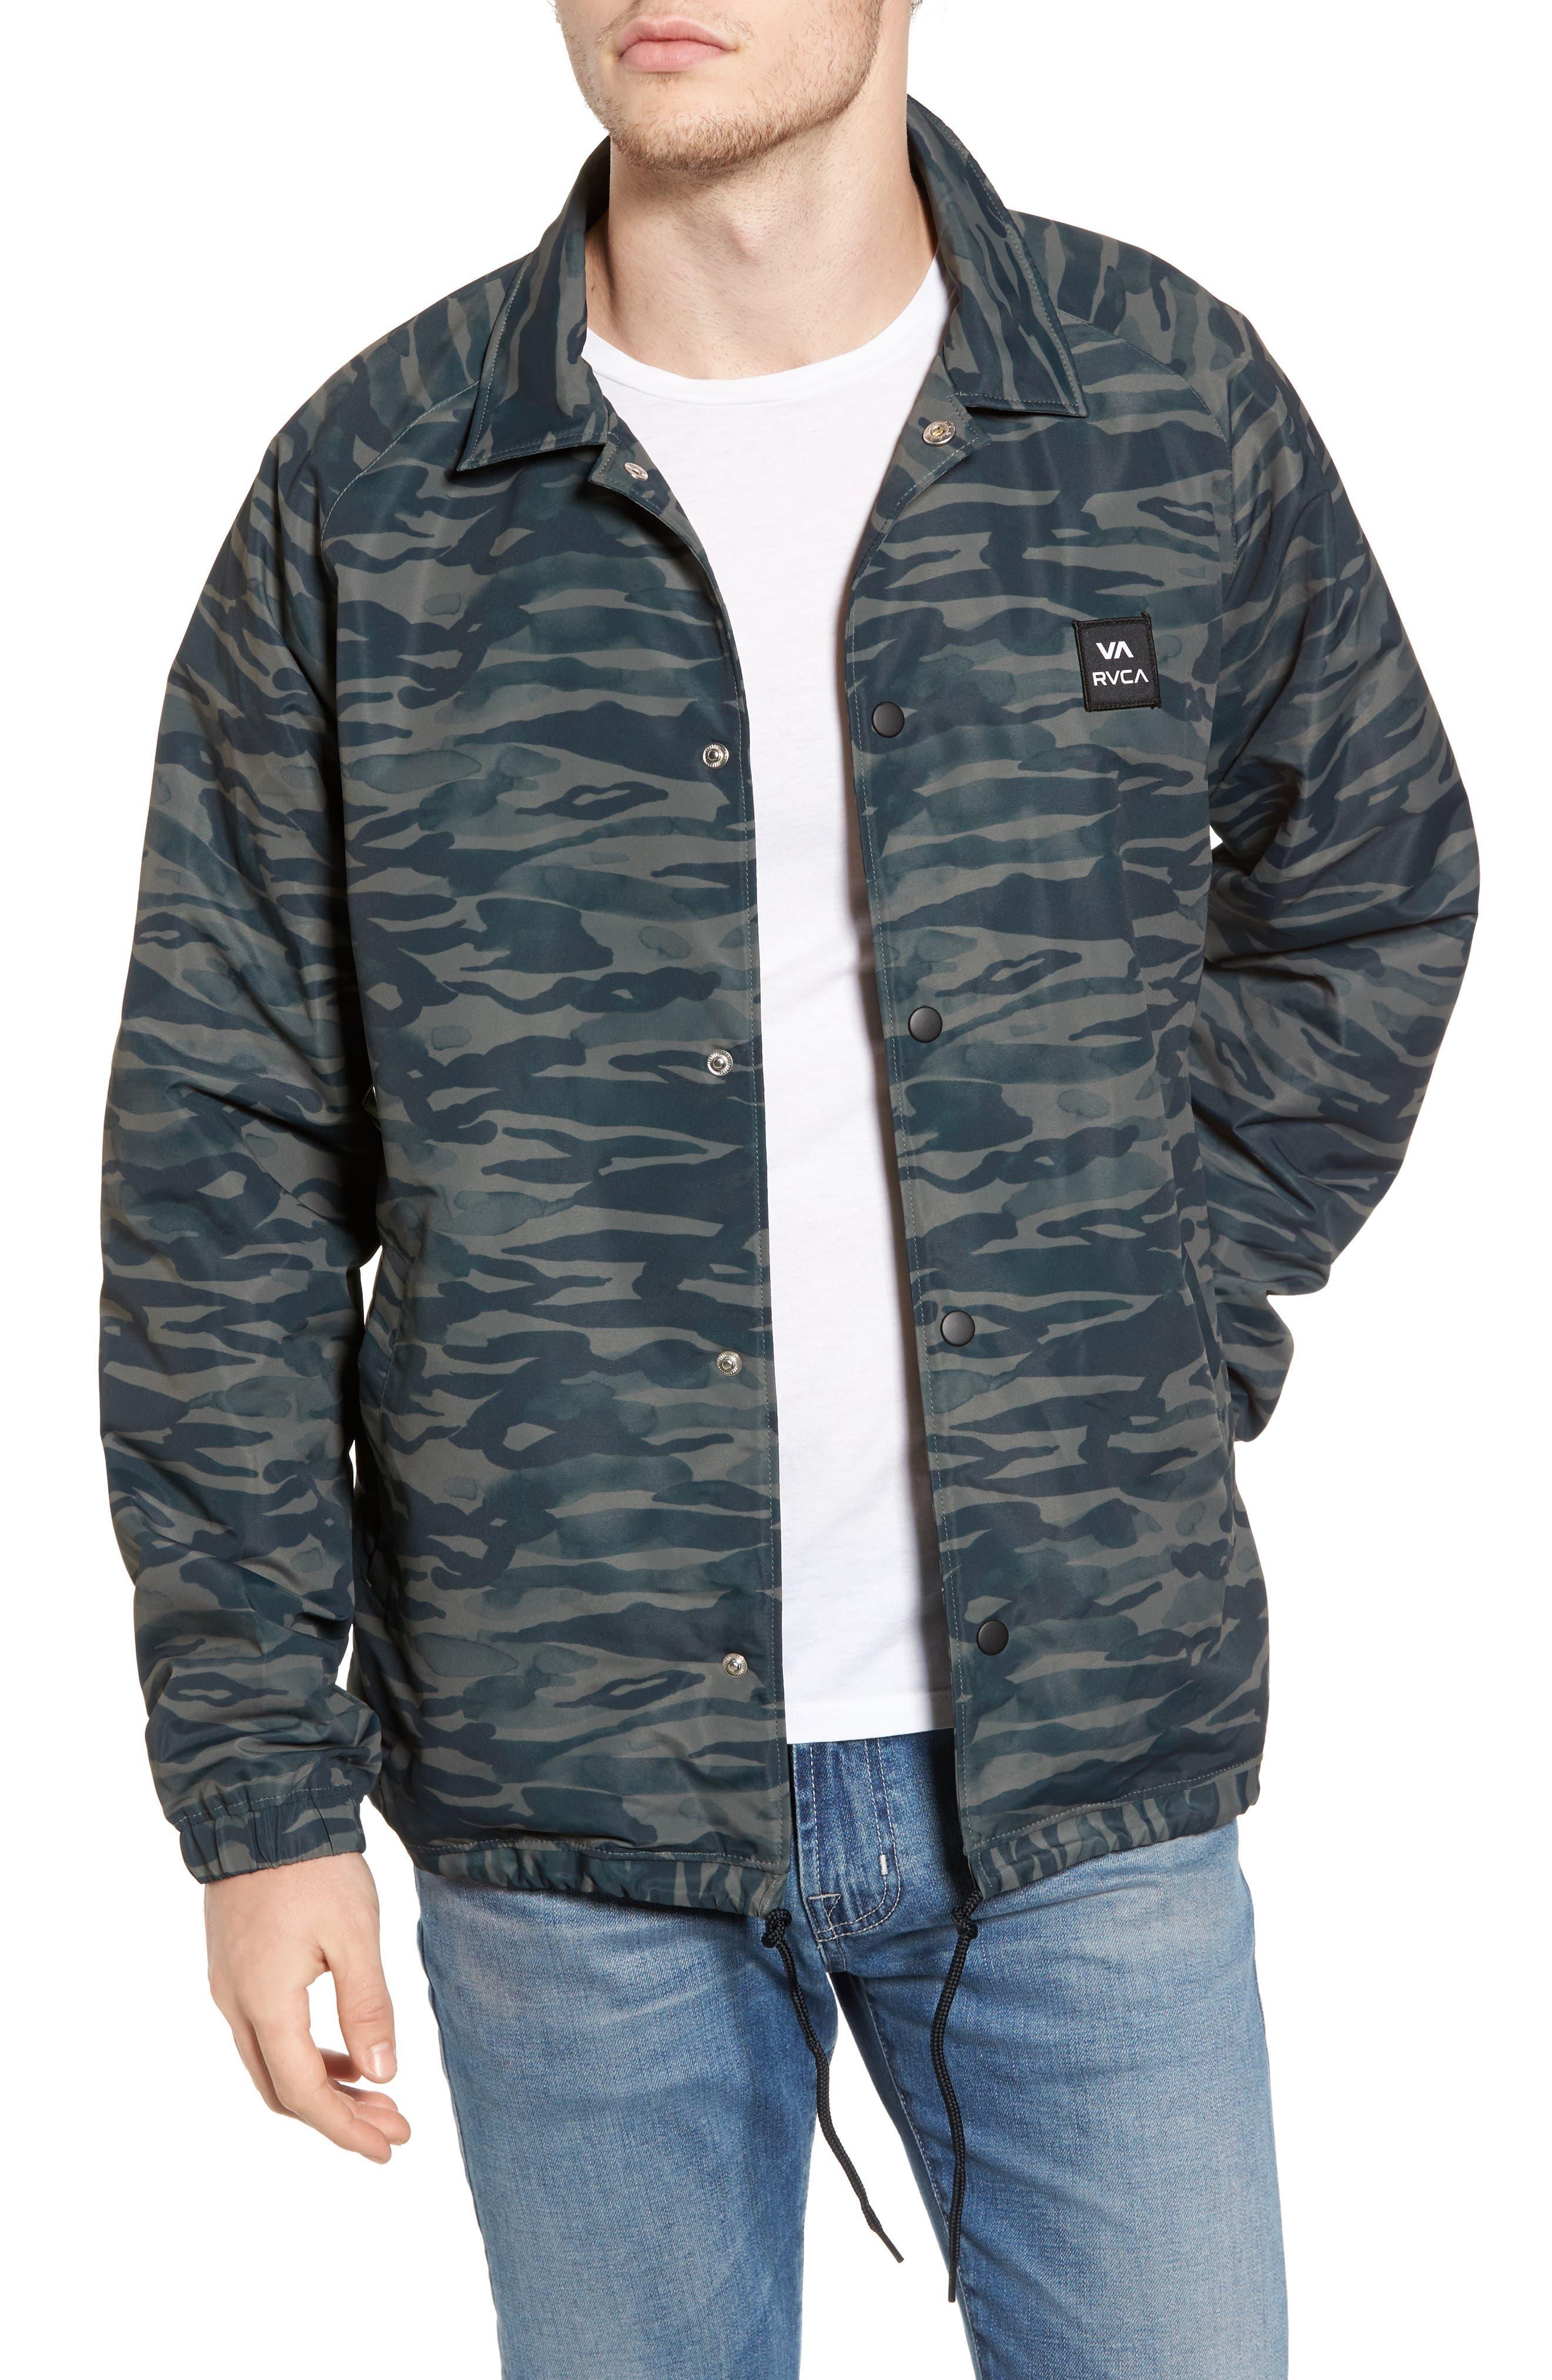 RVCA All the Way Coach's Jacket